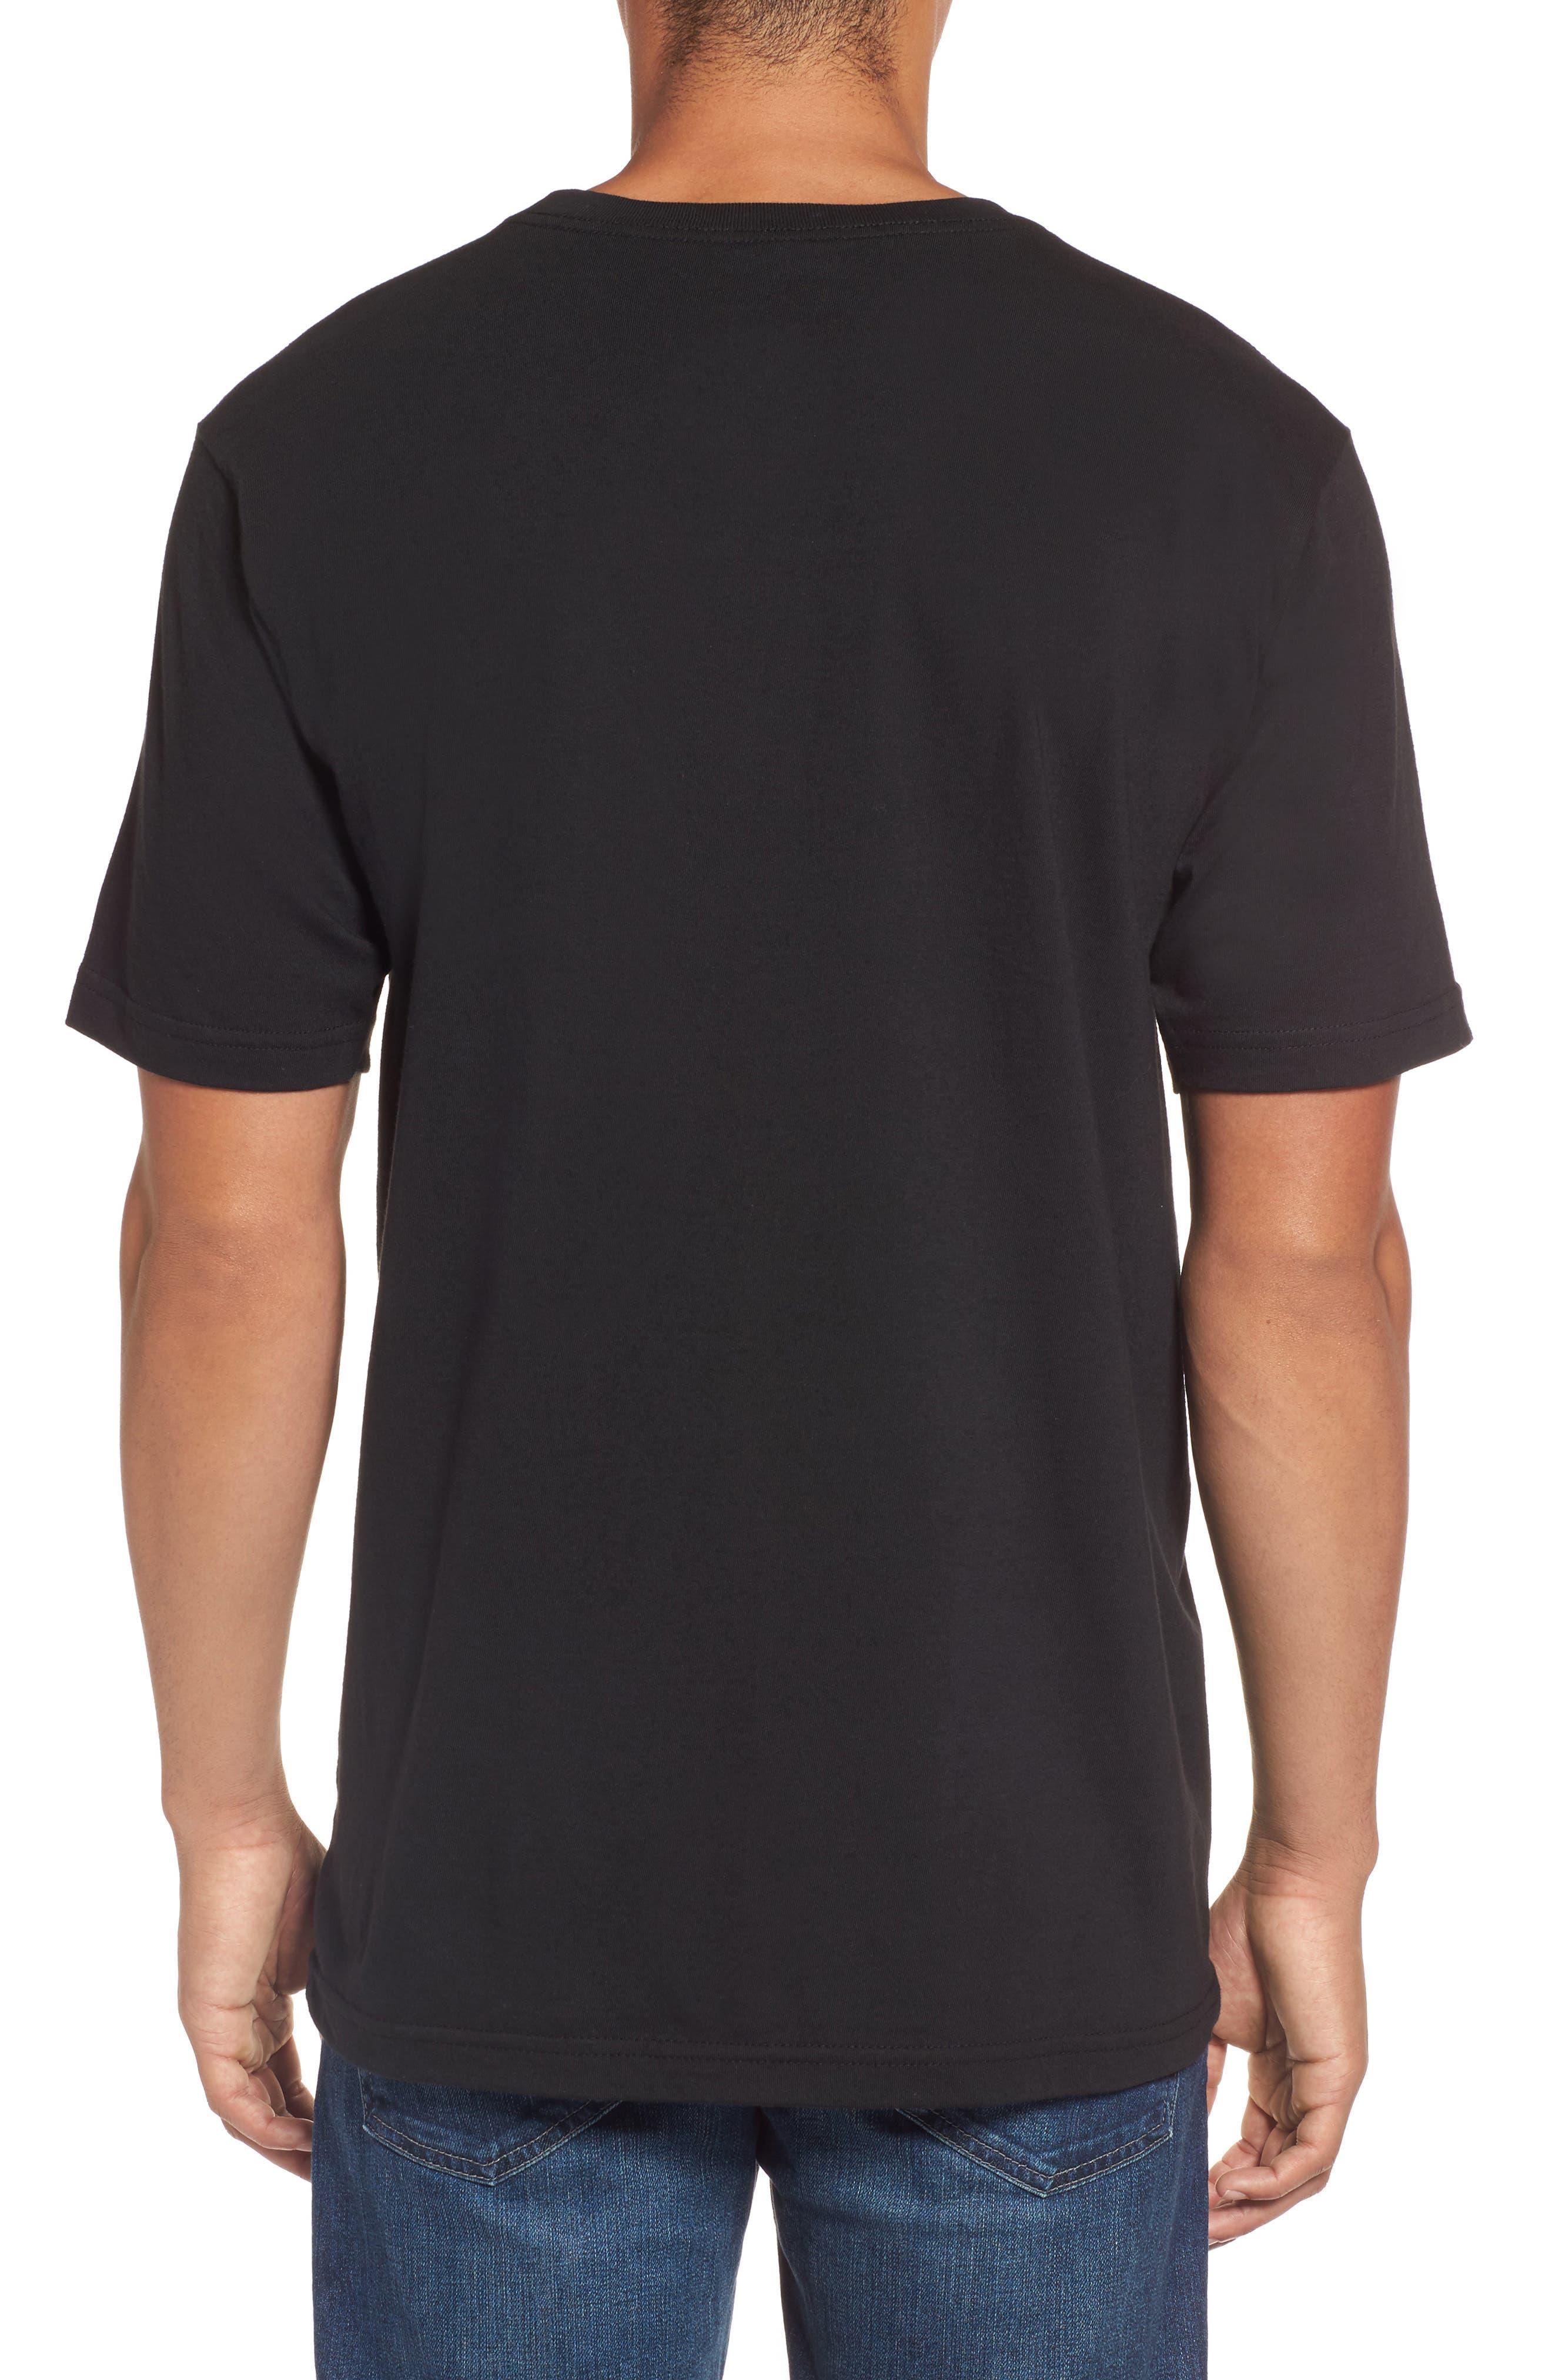 Cage Classic Graphic T-Shirt,                             Alternate thumbnail 2, color,                             Black